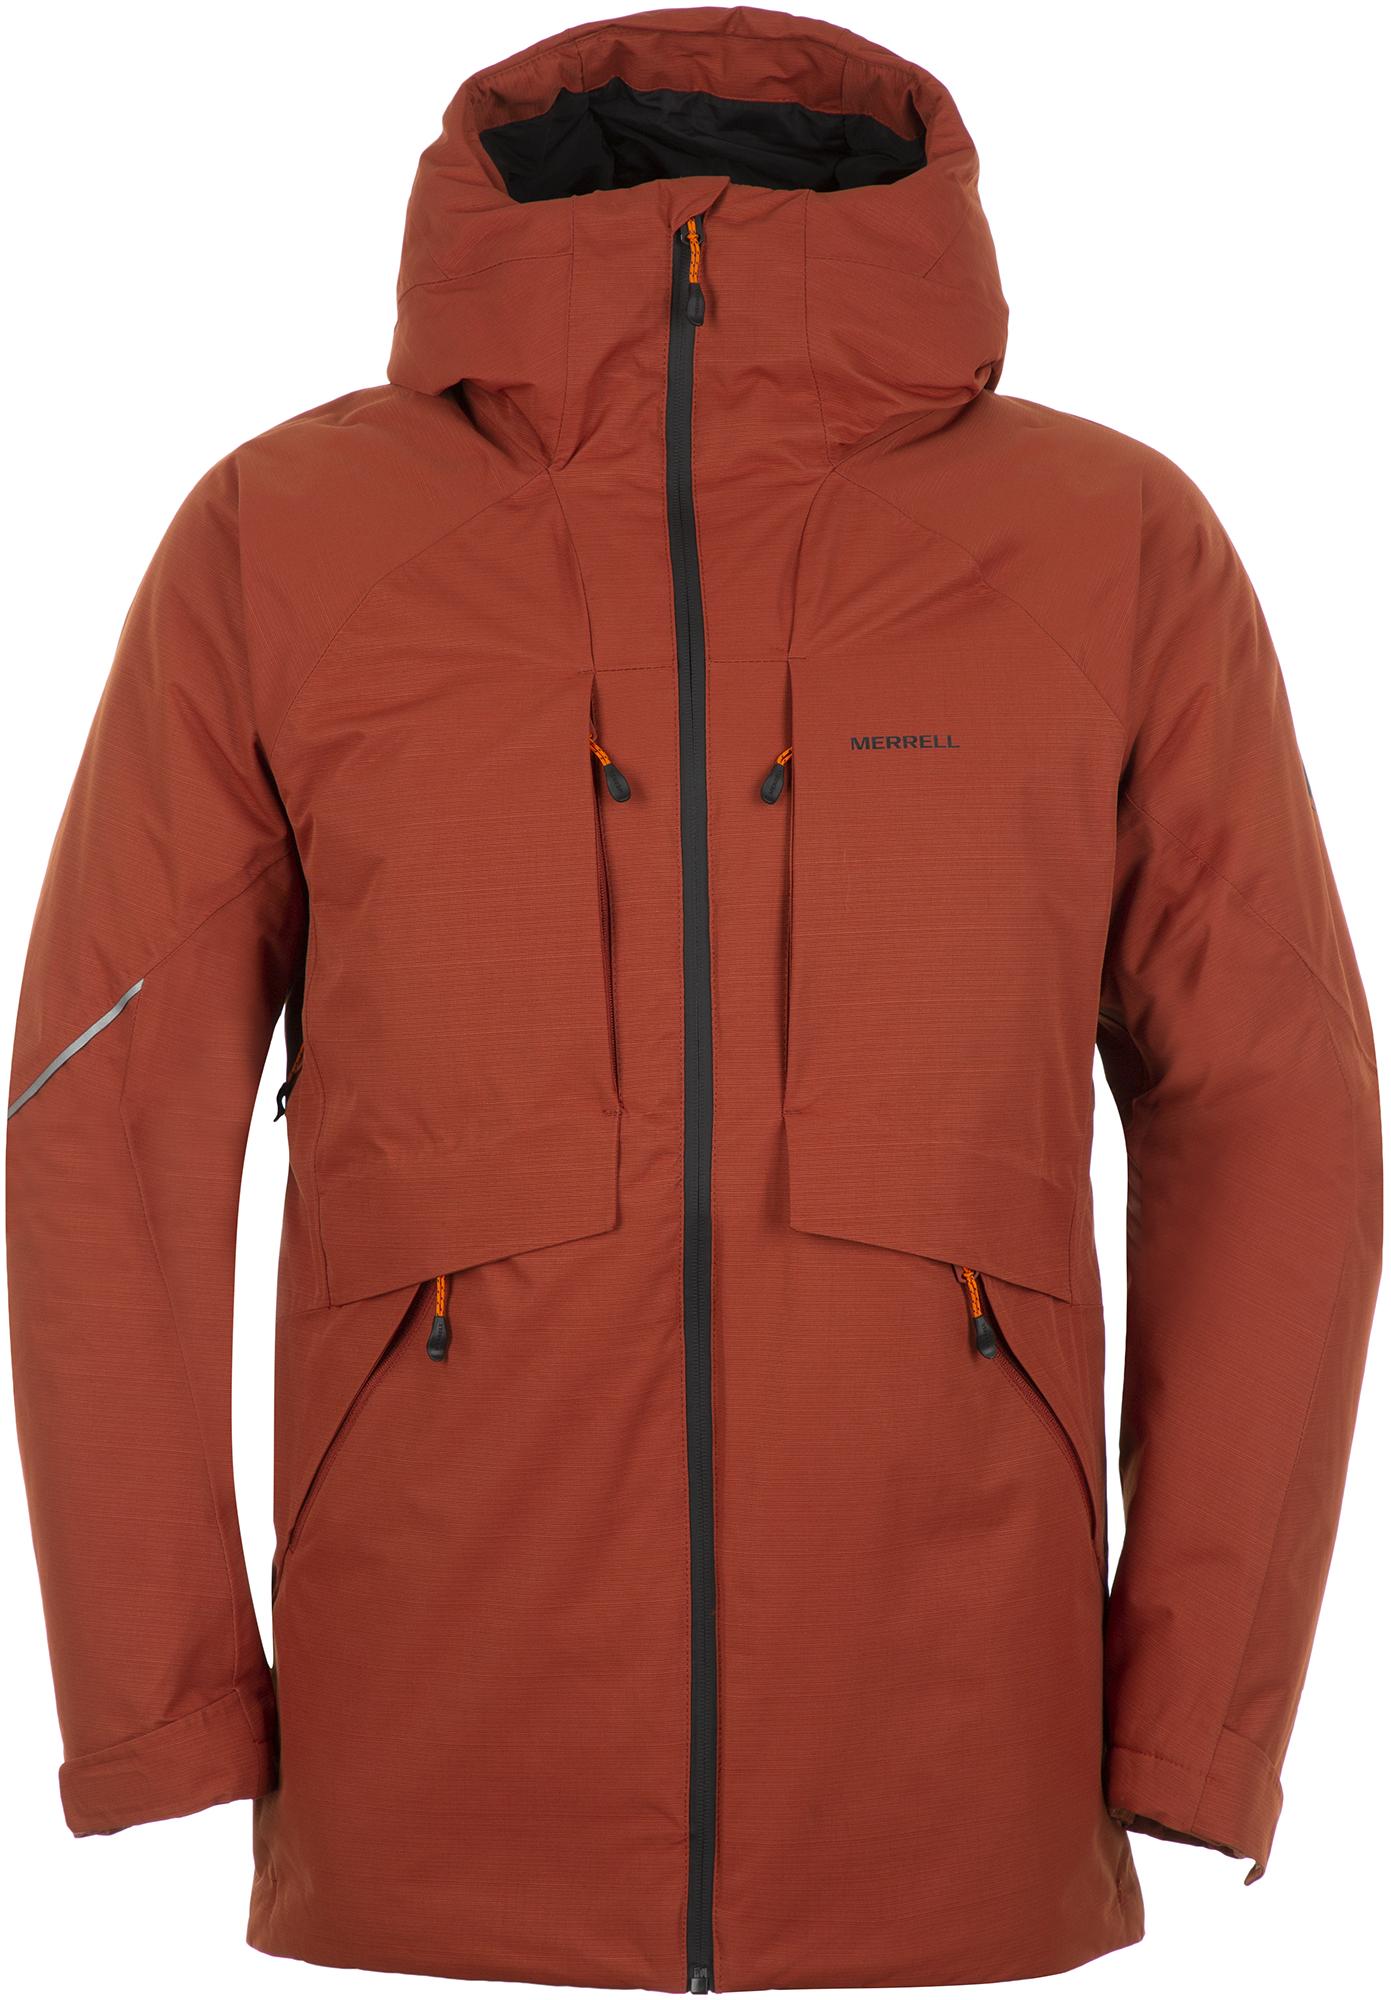 Merrell Куртка утепленная мужская Merrell, размер 56 merrell ветровка мужская merrell размер 50